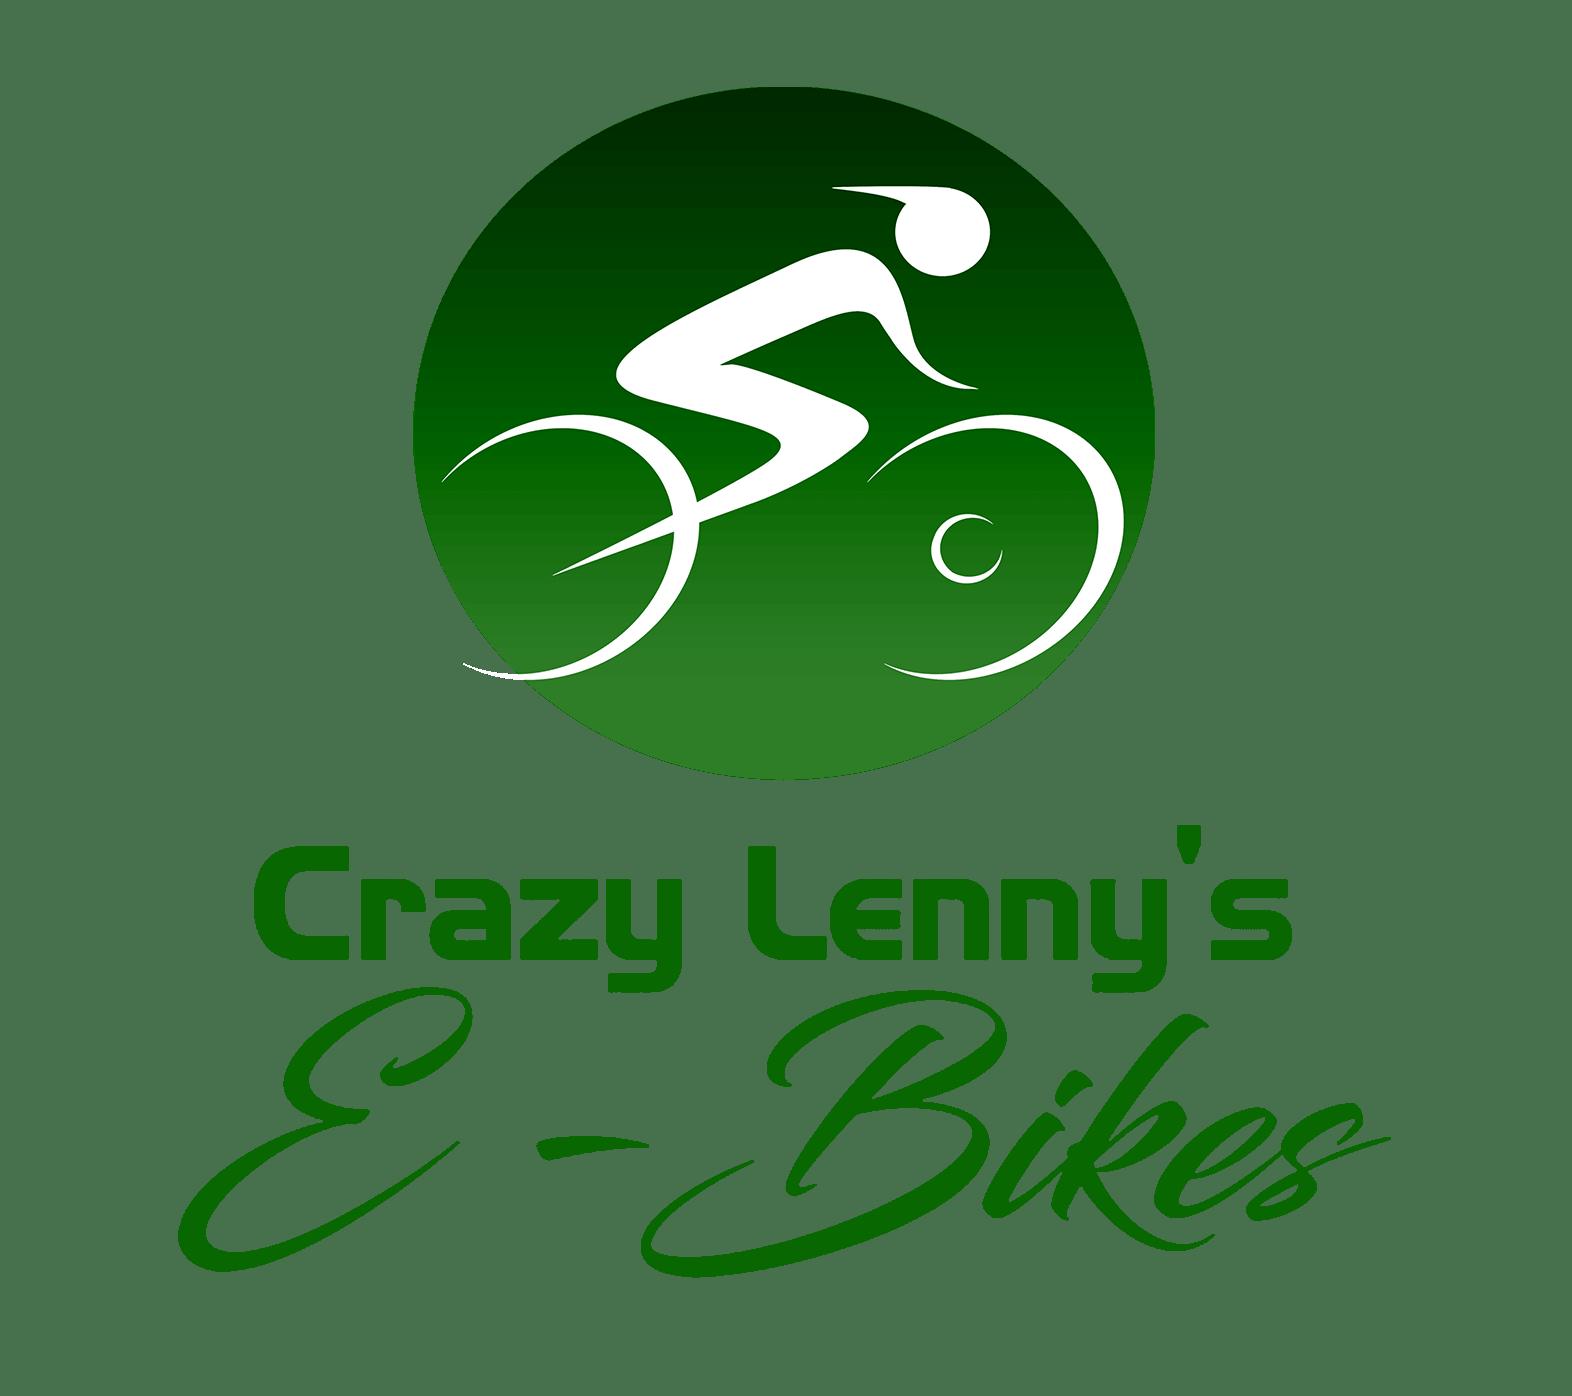 Crazy-Lennys-E-Bikes-Logo.png